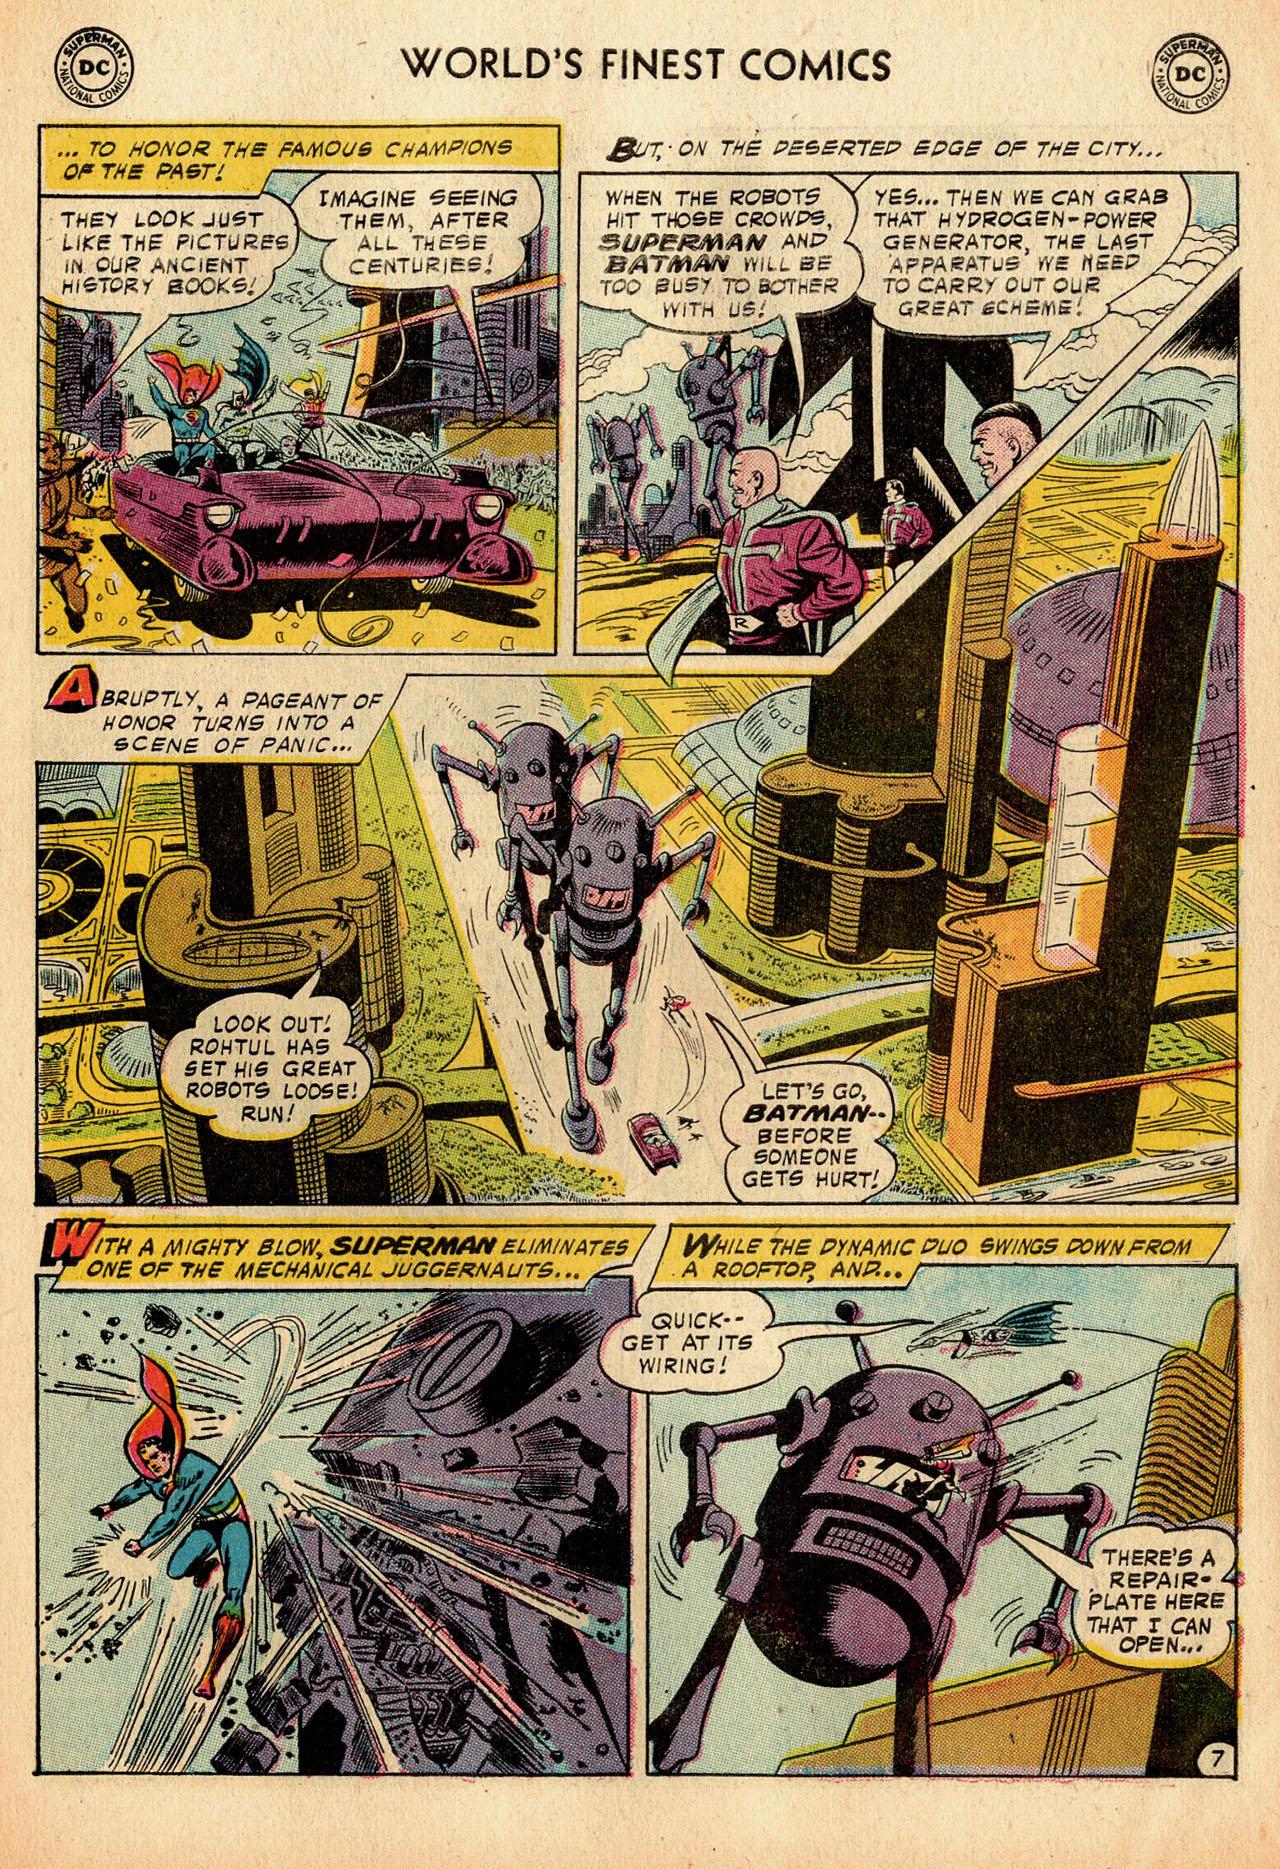 Read online World's Finest Comics comic -  Issue #91 - 9